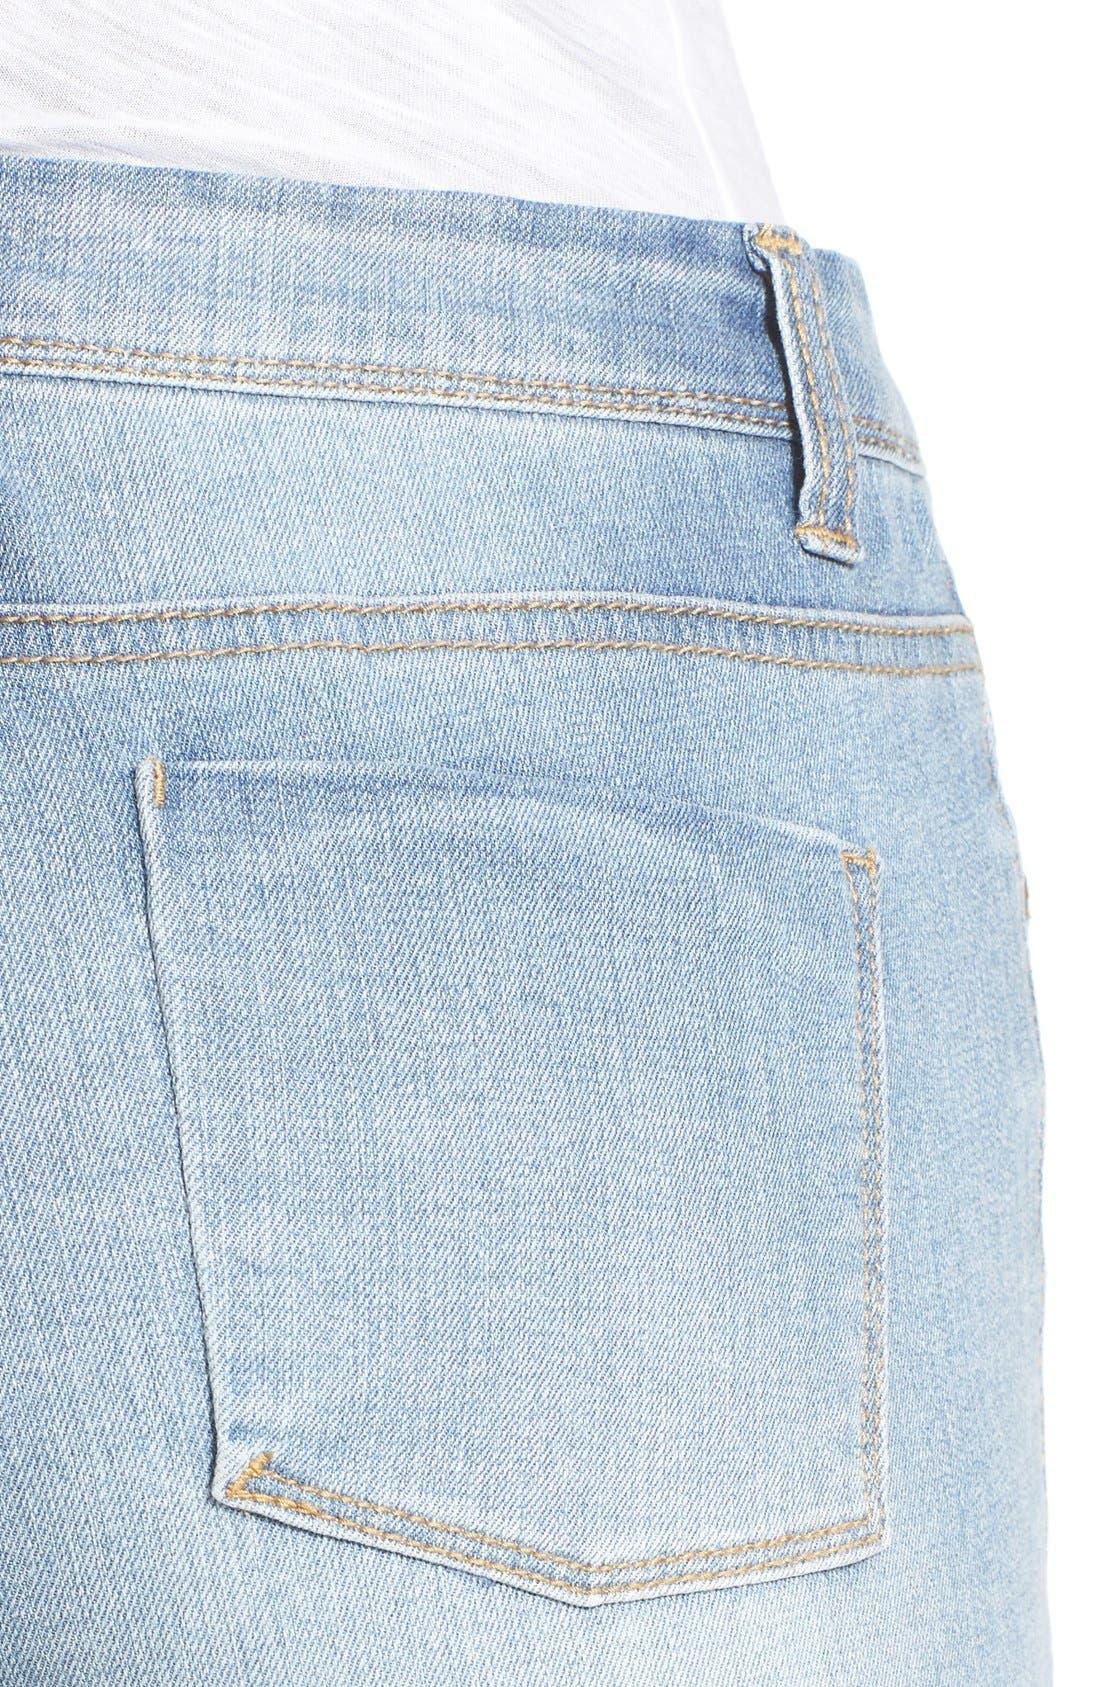 Alternate Image 2  - Generra High Waist Skinny Jeans (Mastic)